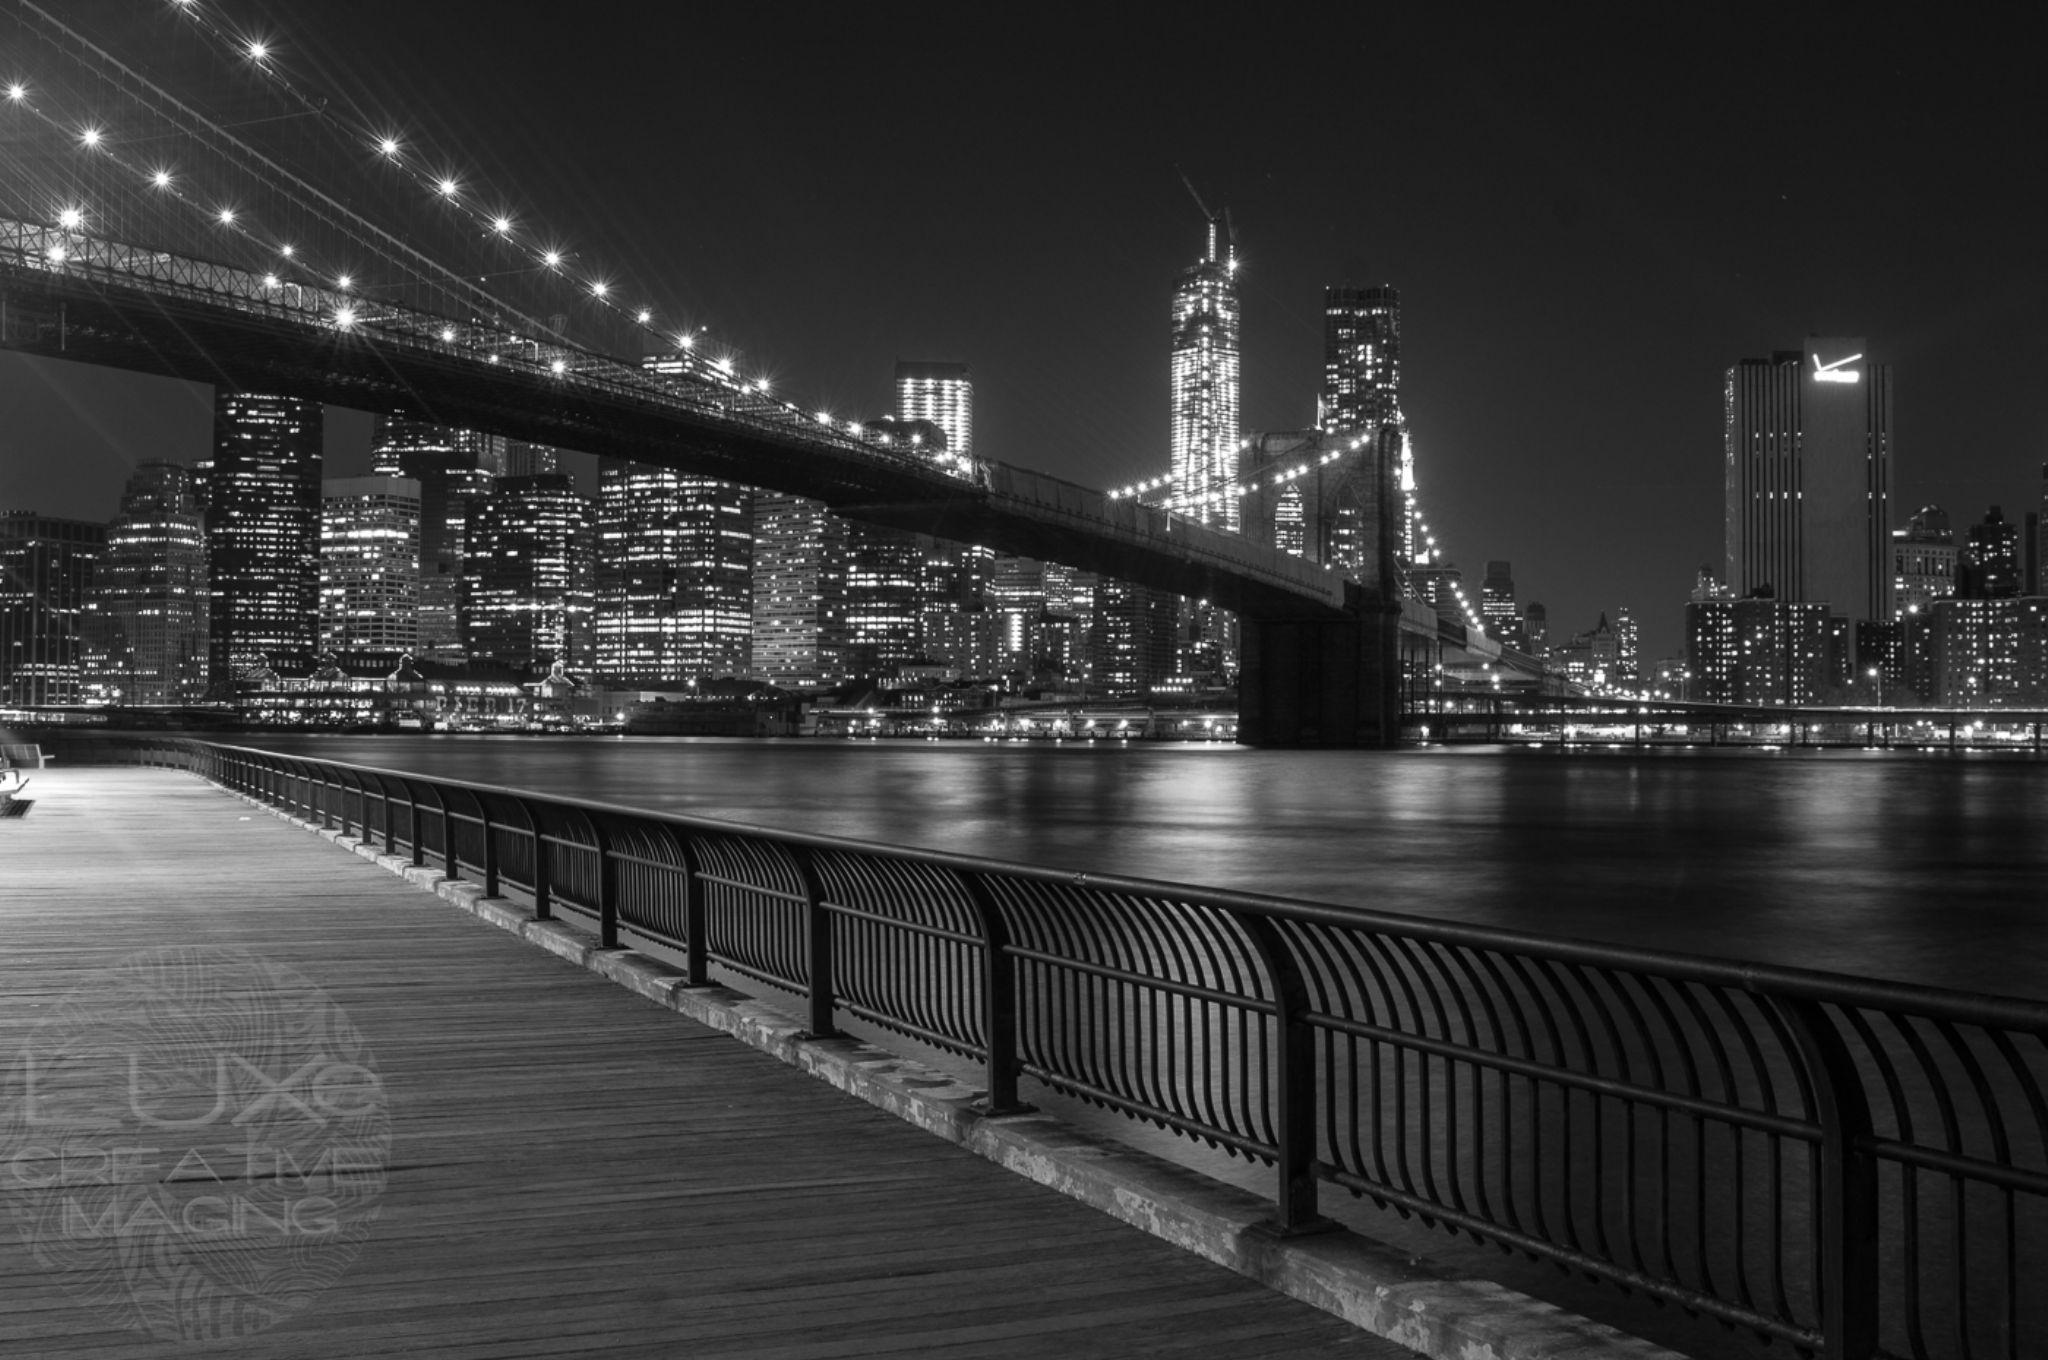 Bridge & City by George Pruitt